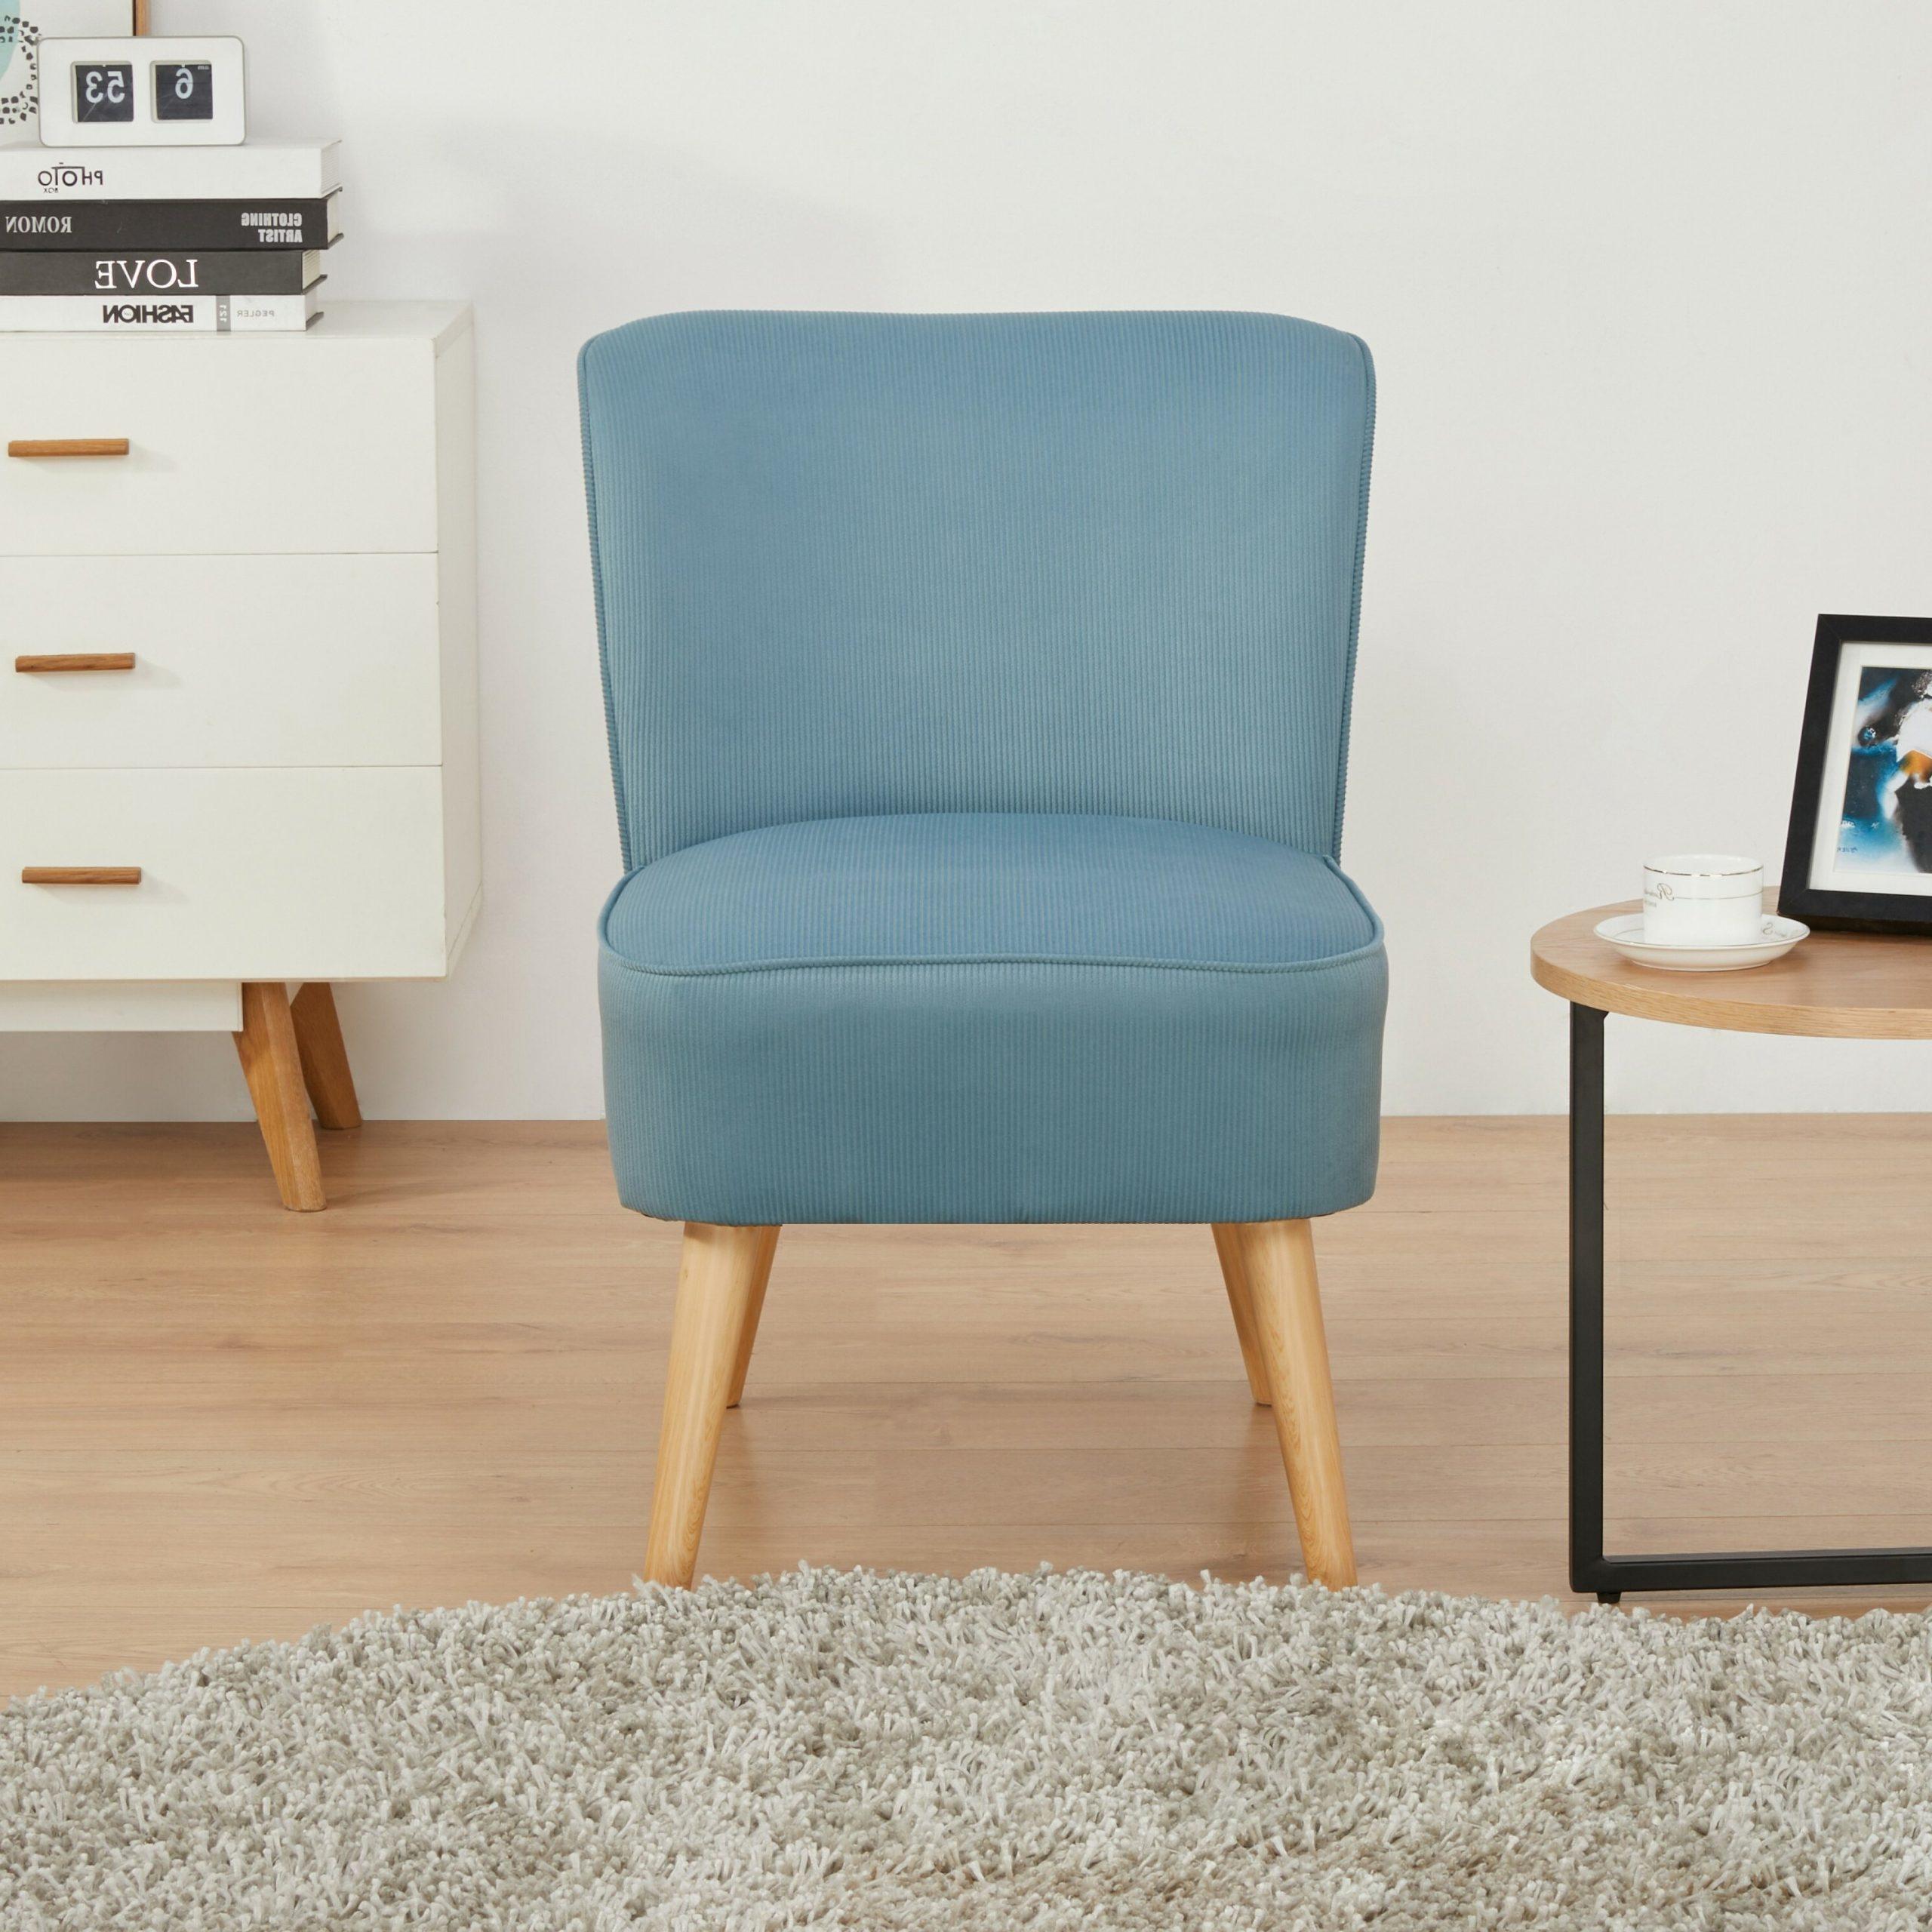 Allard Charleston Slipper Chair Regarding Recent Aalivia Slipper Chairs (View 6 of 20)